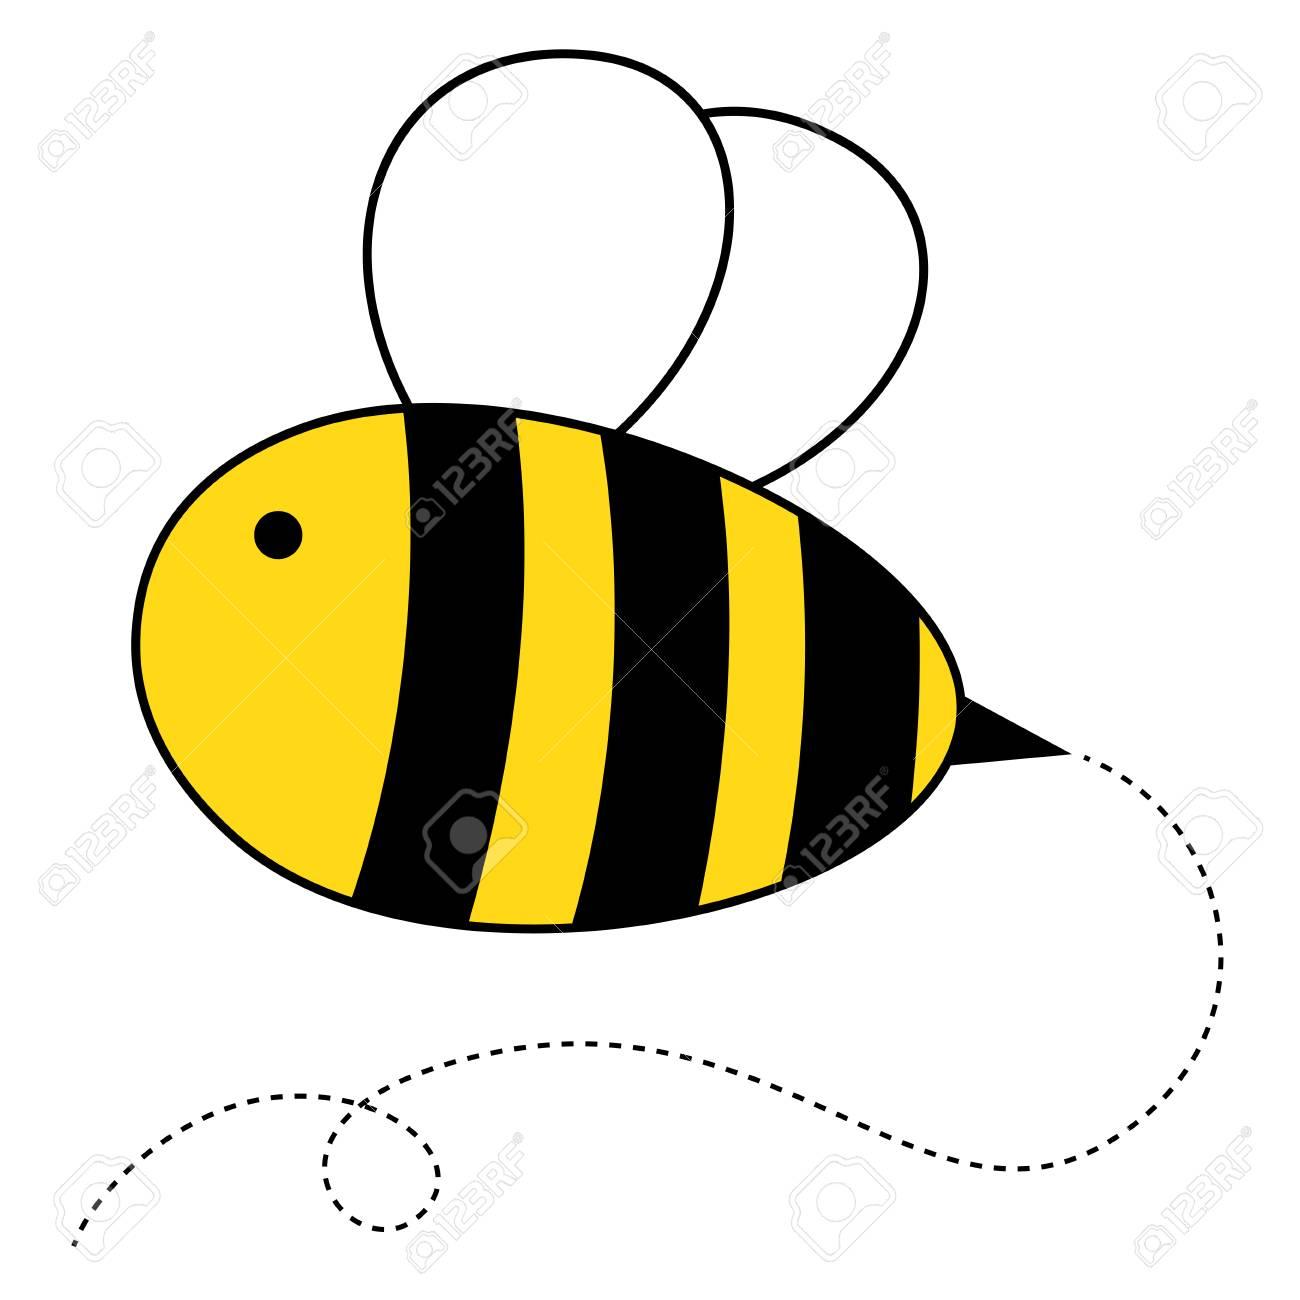 cute cartoon honey bee vector illustration royalty free cliparts rh 123rf com bee vector drawing bee vector free